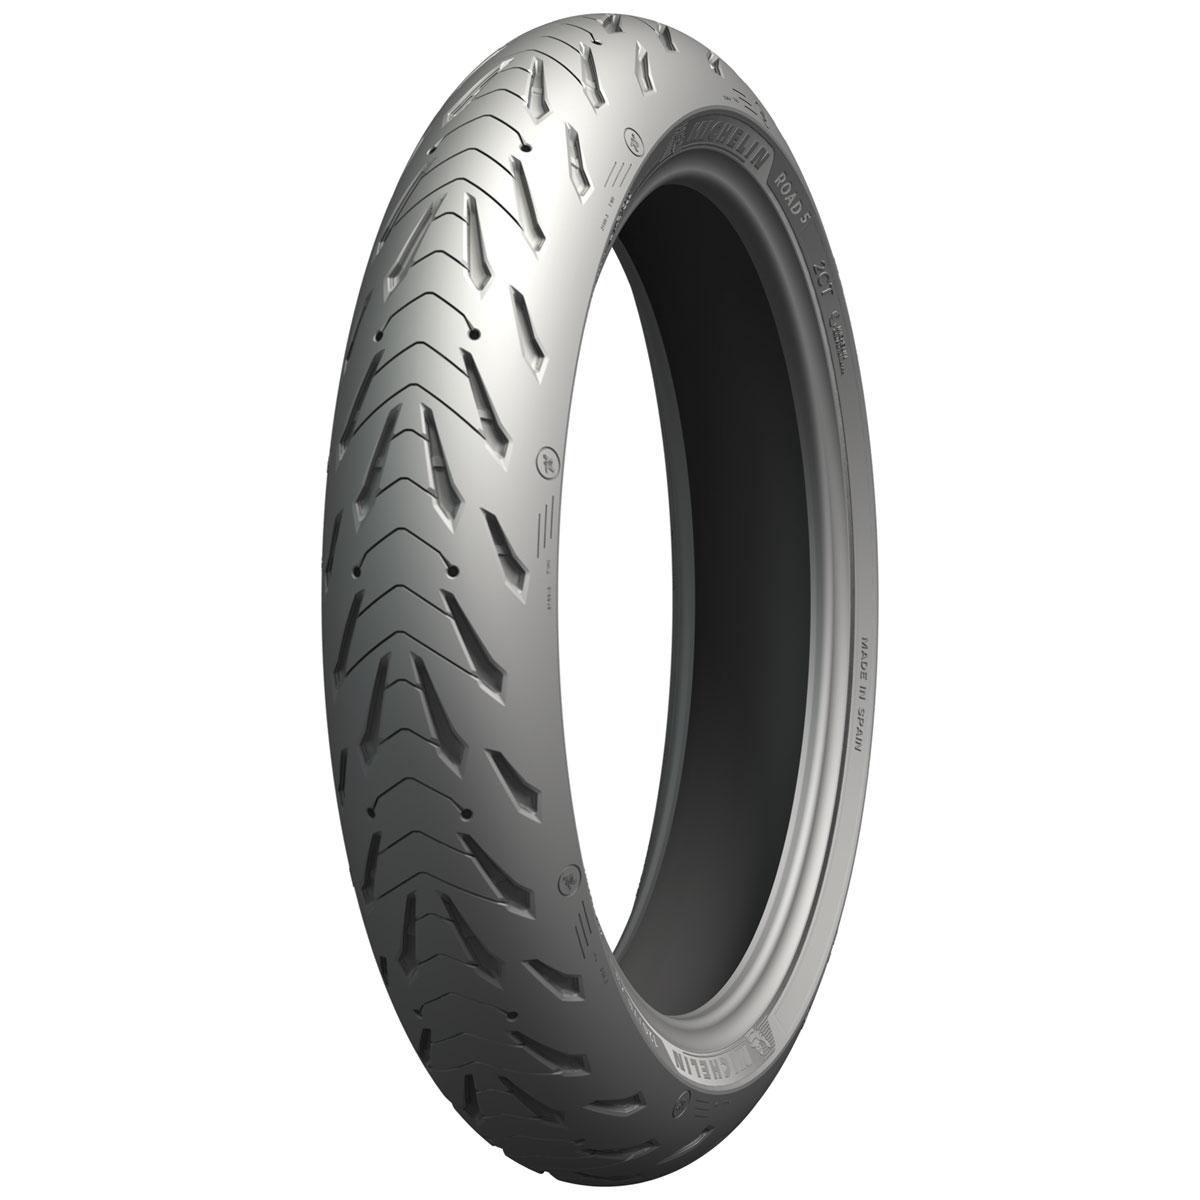 Michelin Road 5 120/70ZR17 Front Tire